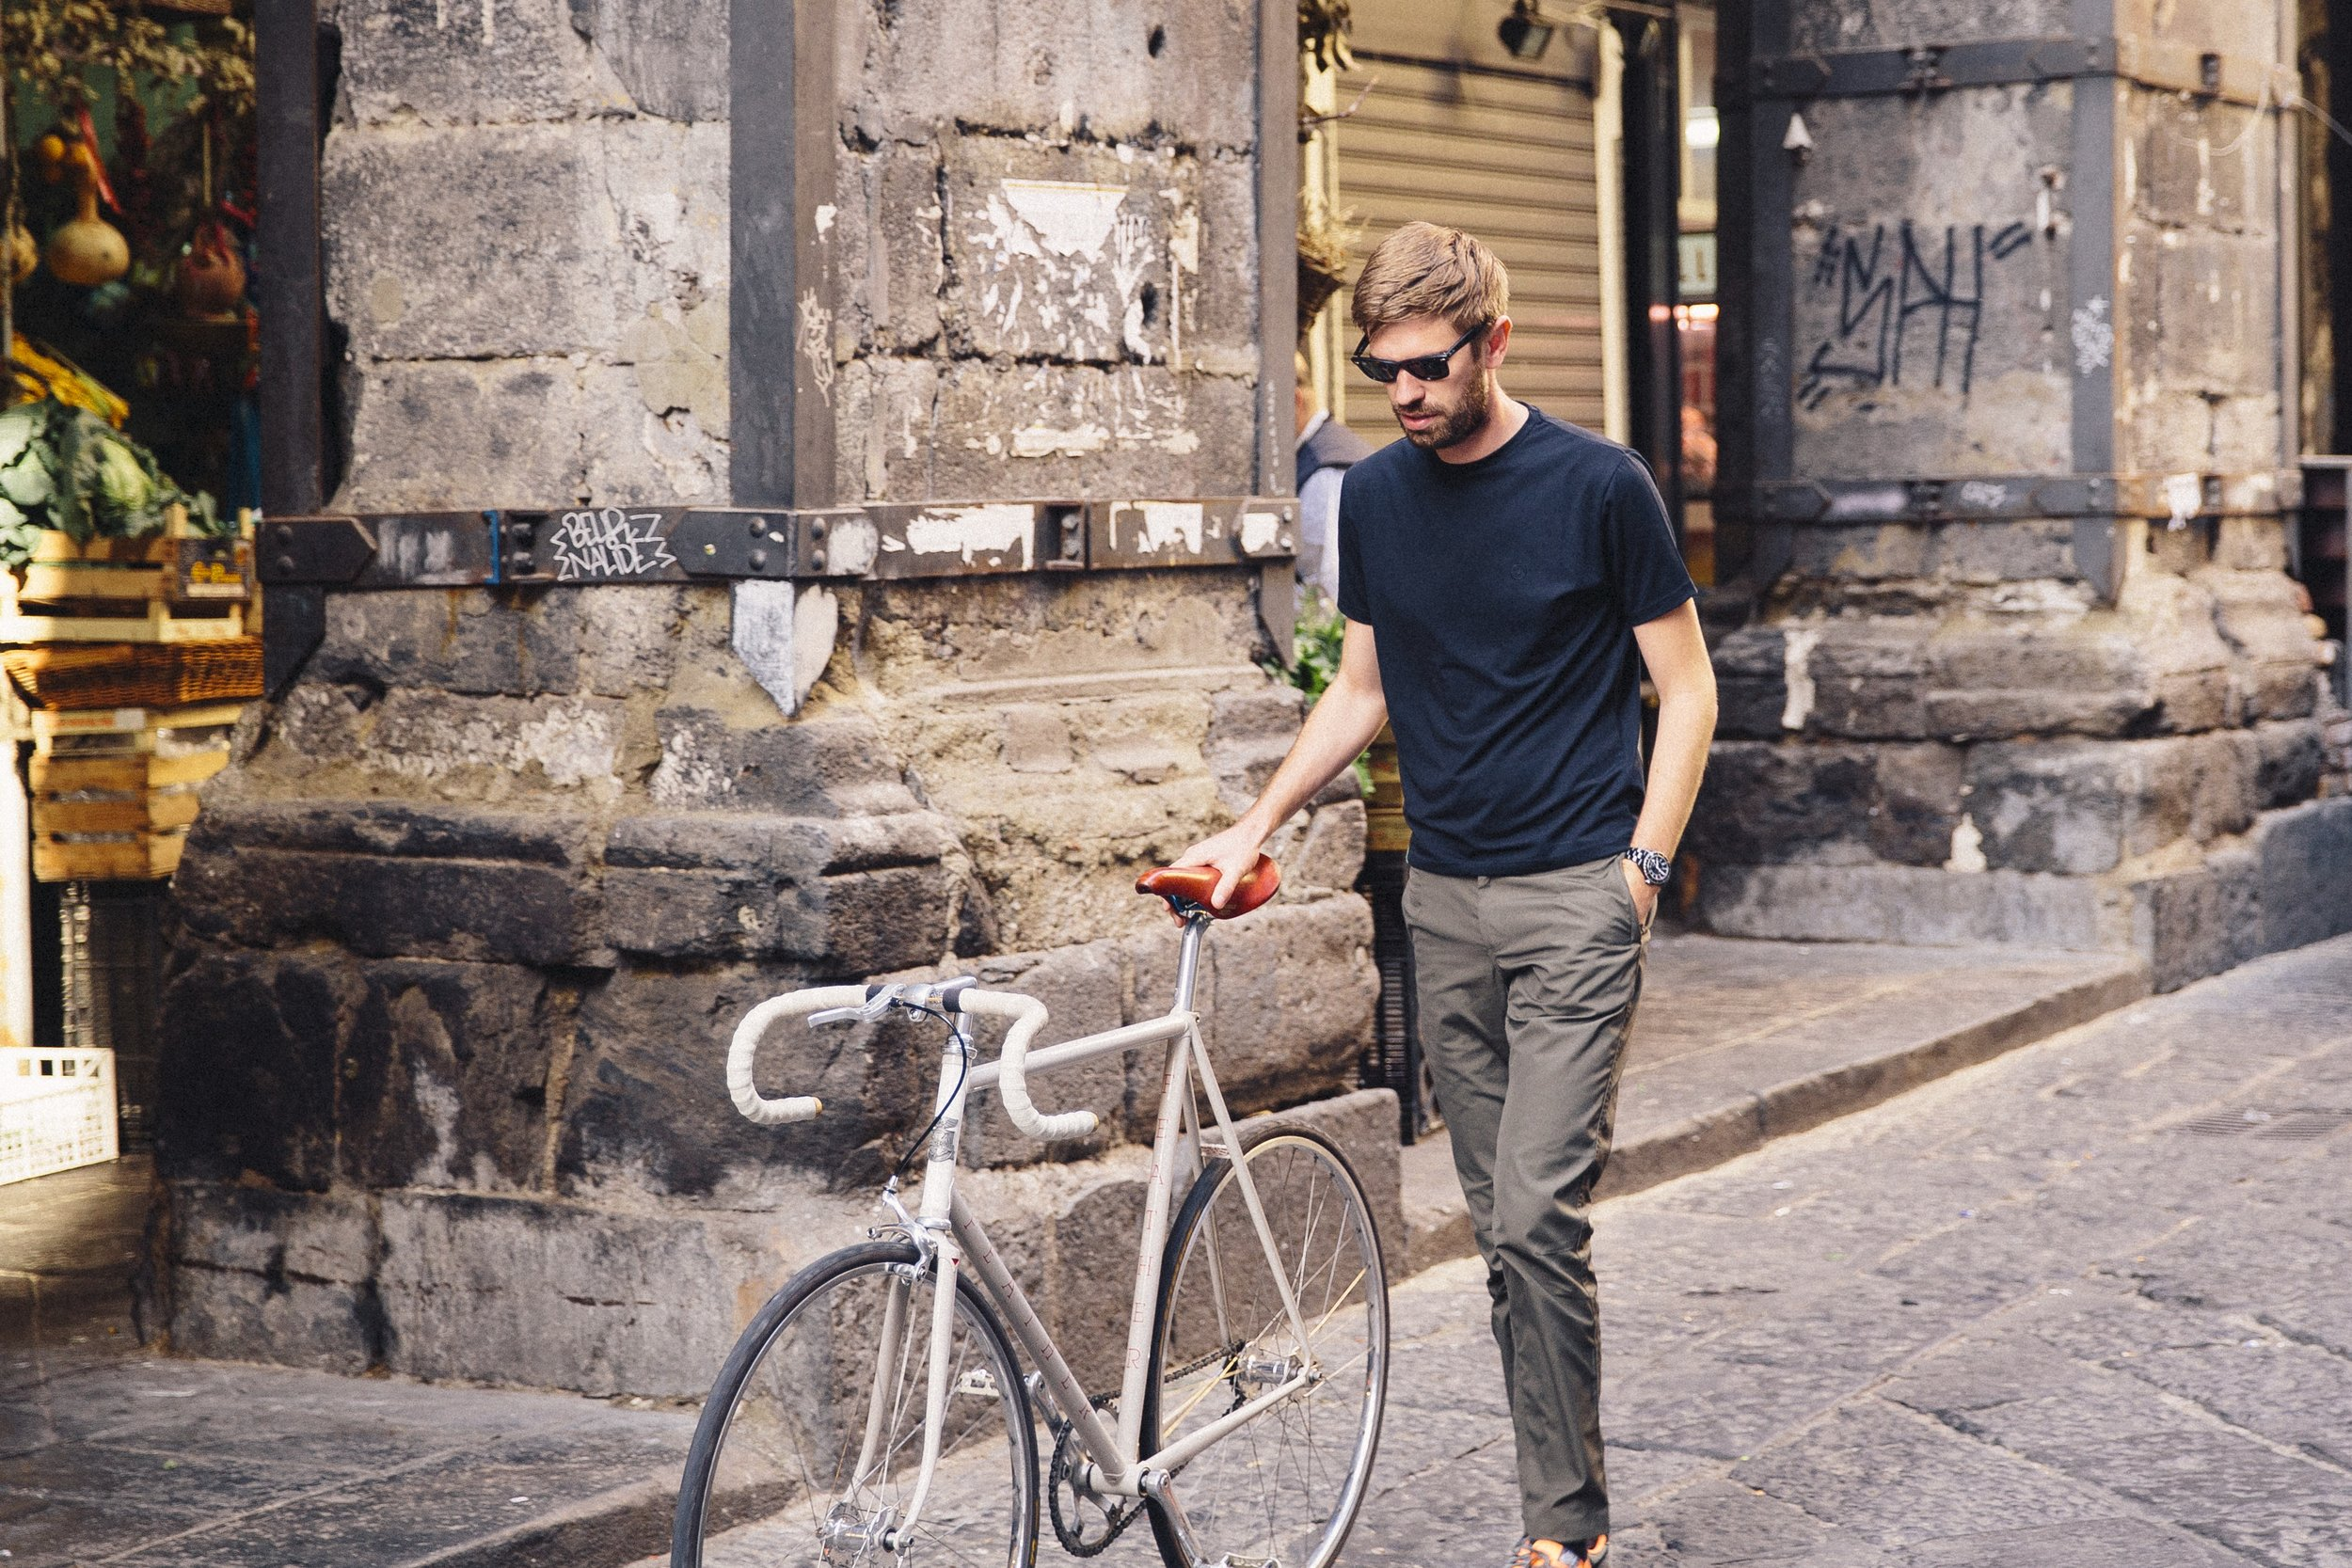 vulpine nick hussey cycling style apparel urban city.jpg